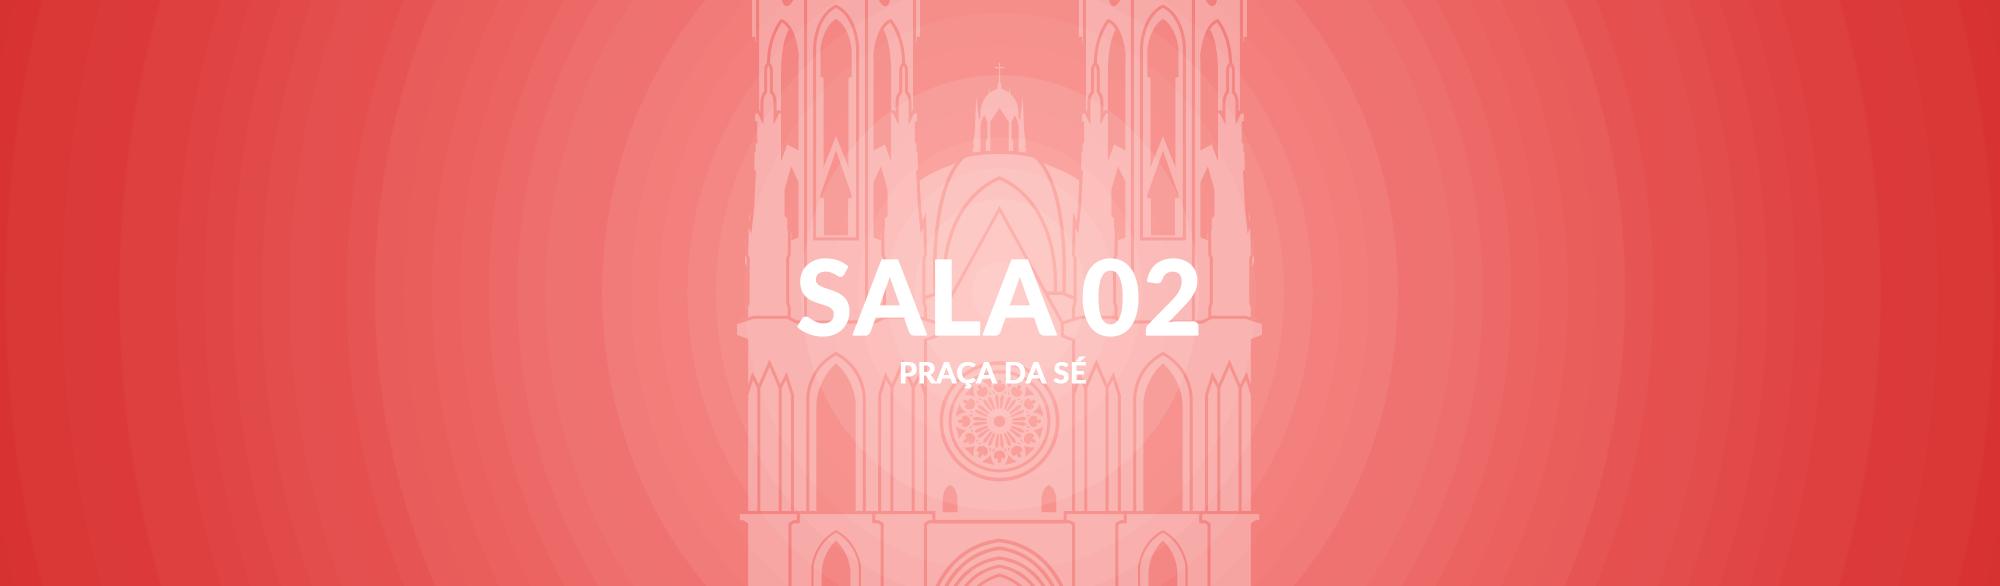 Banner dia01 sala02